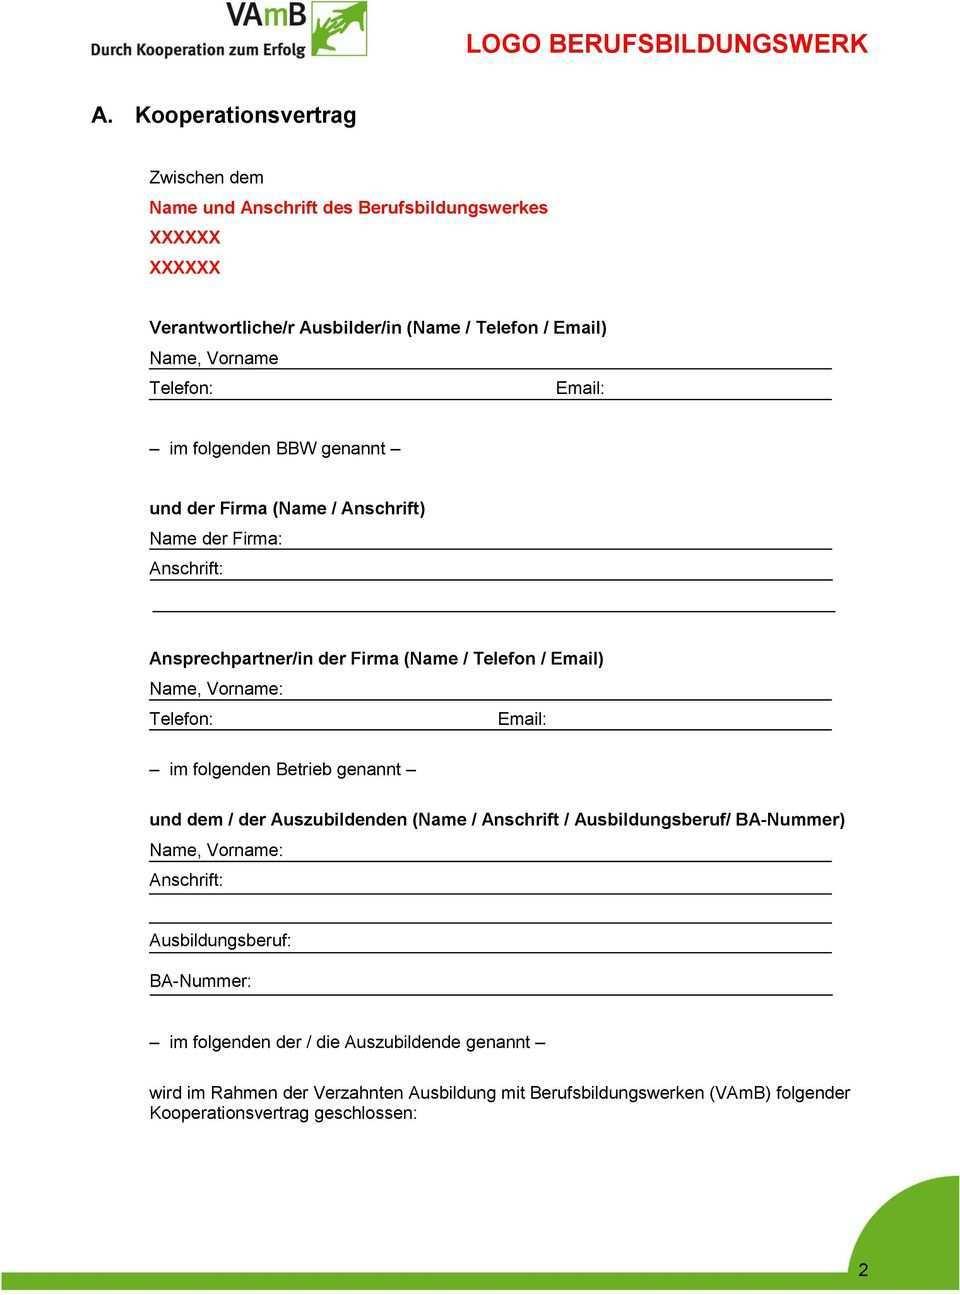 Muster Kooperationsvertrag Pdf Kostenfreier Download